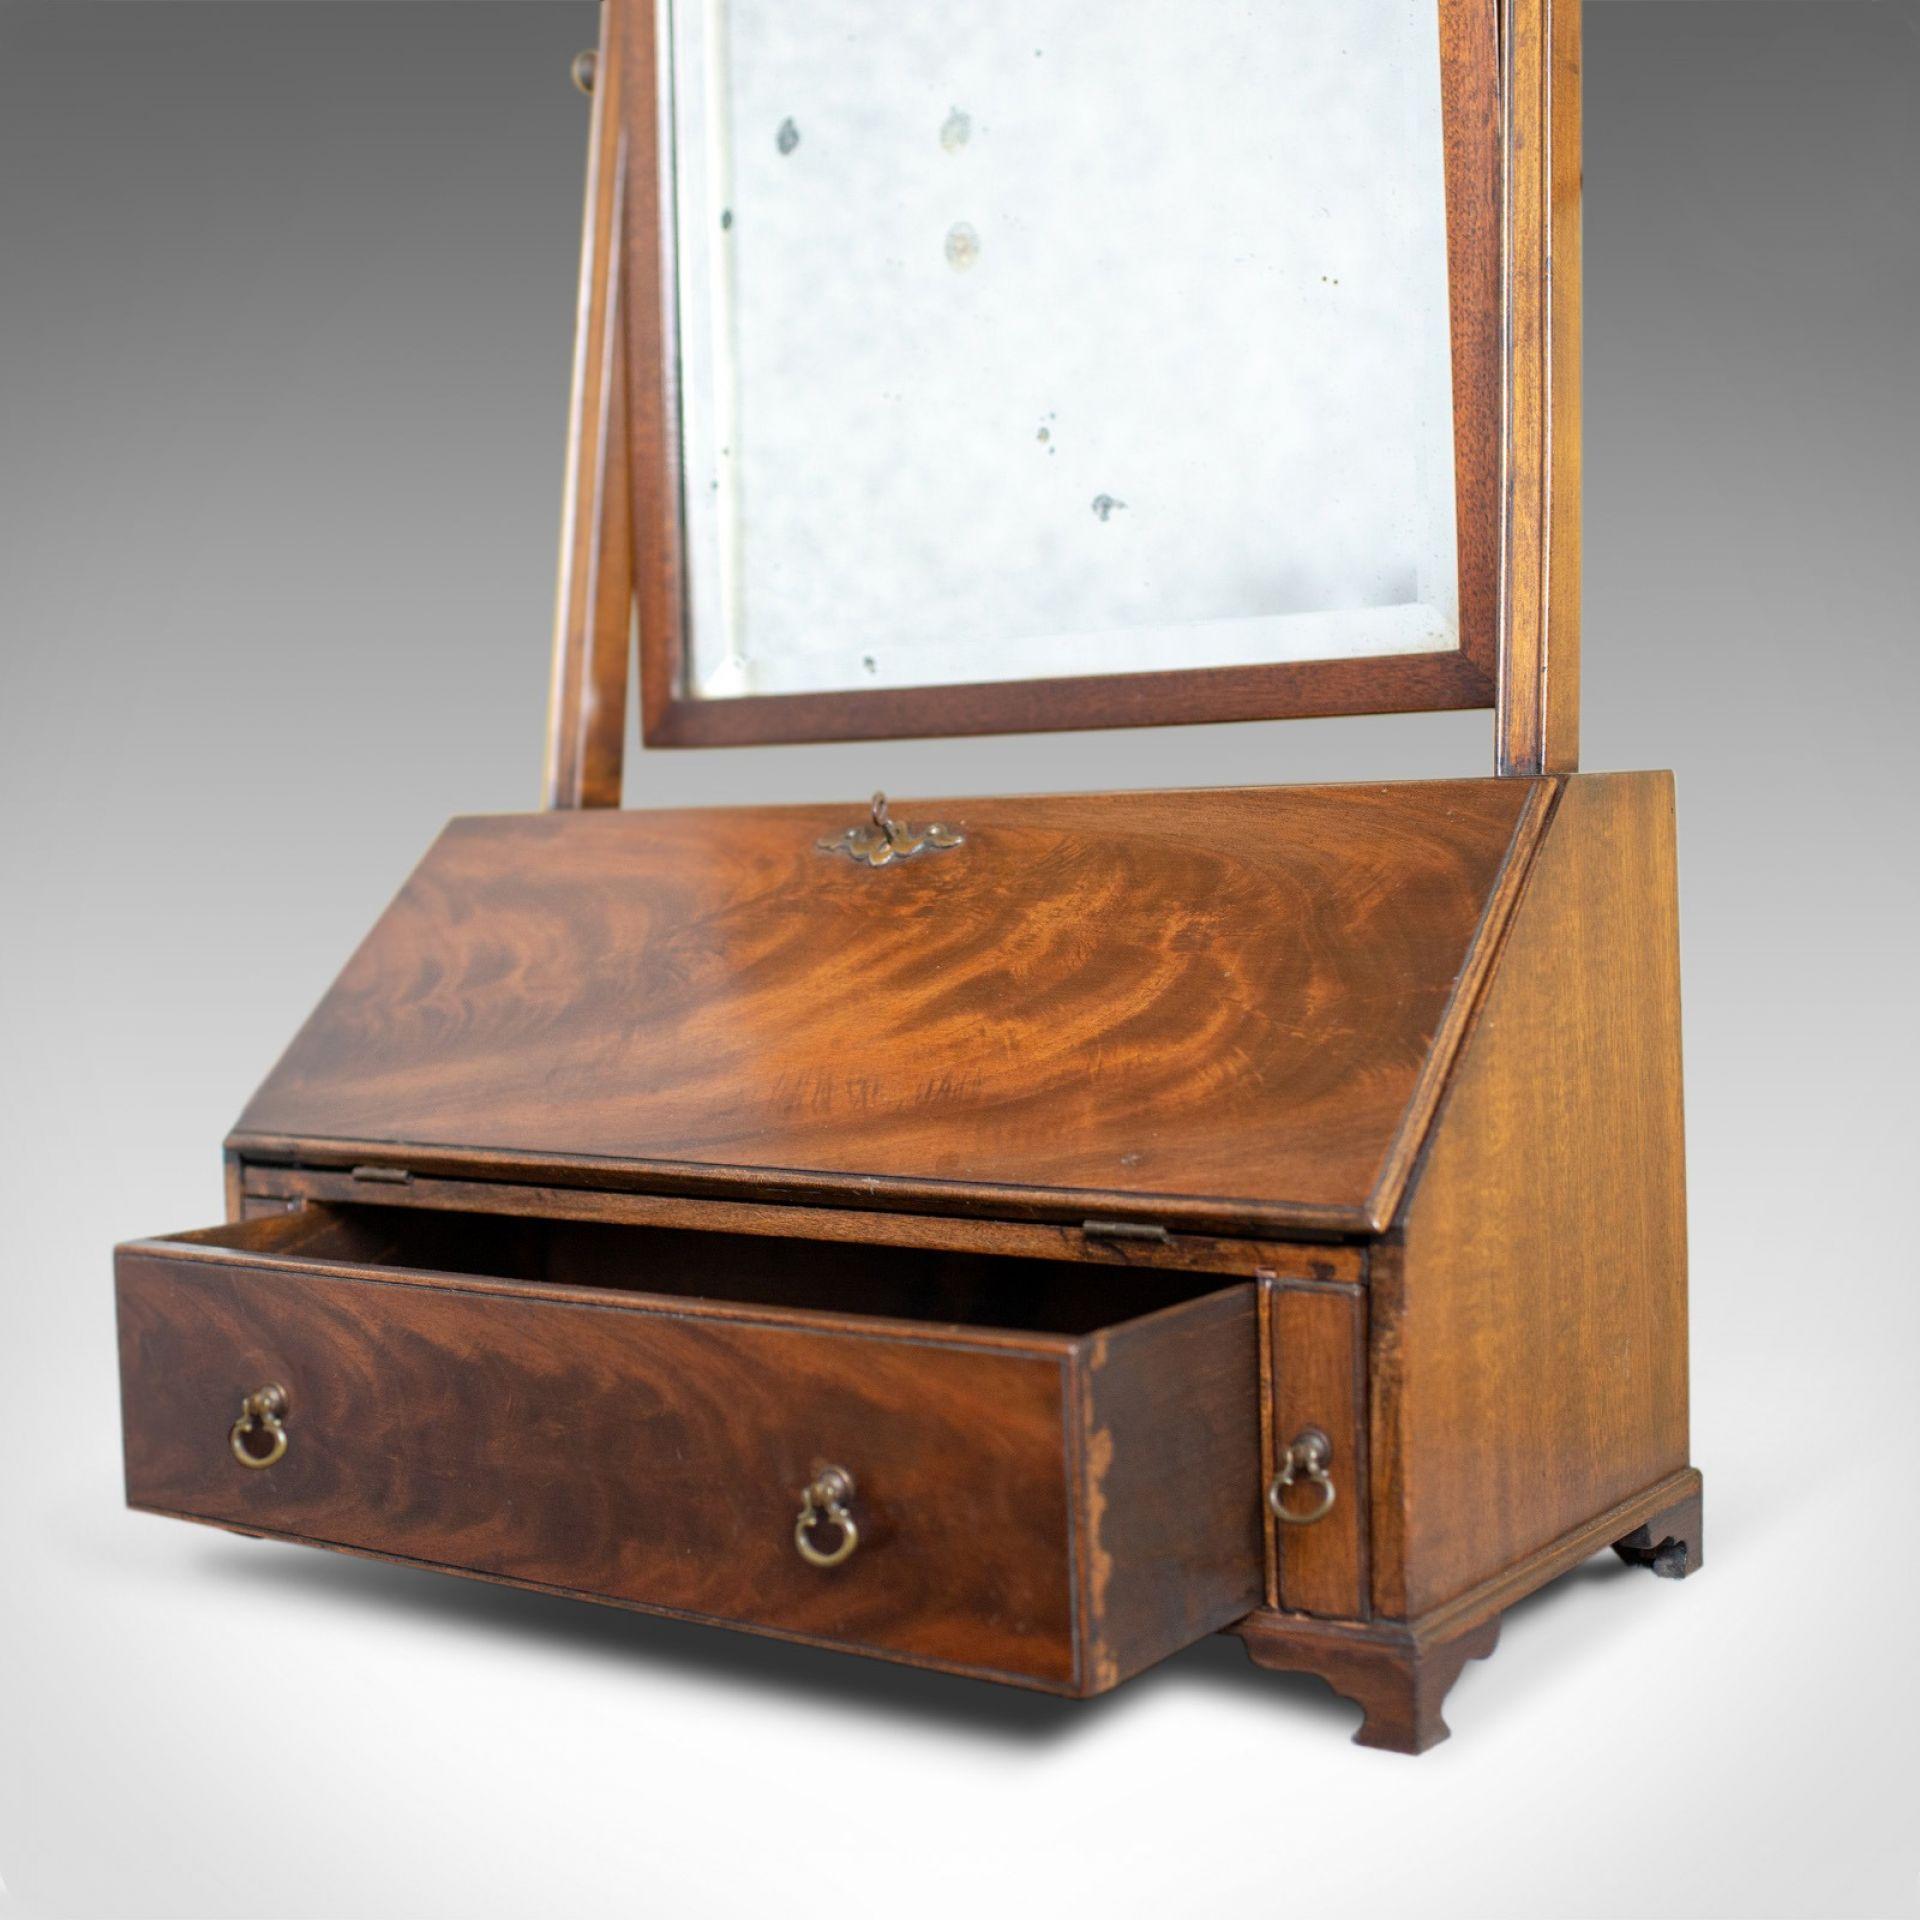 Antique Bureau Mirror, English, Georgian Revival, Mahogany, Toilet Circa 1910